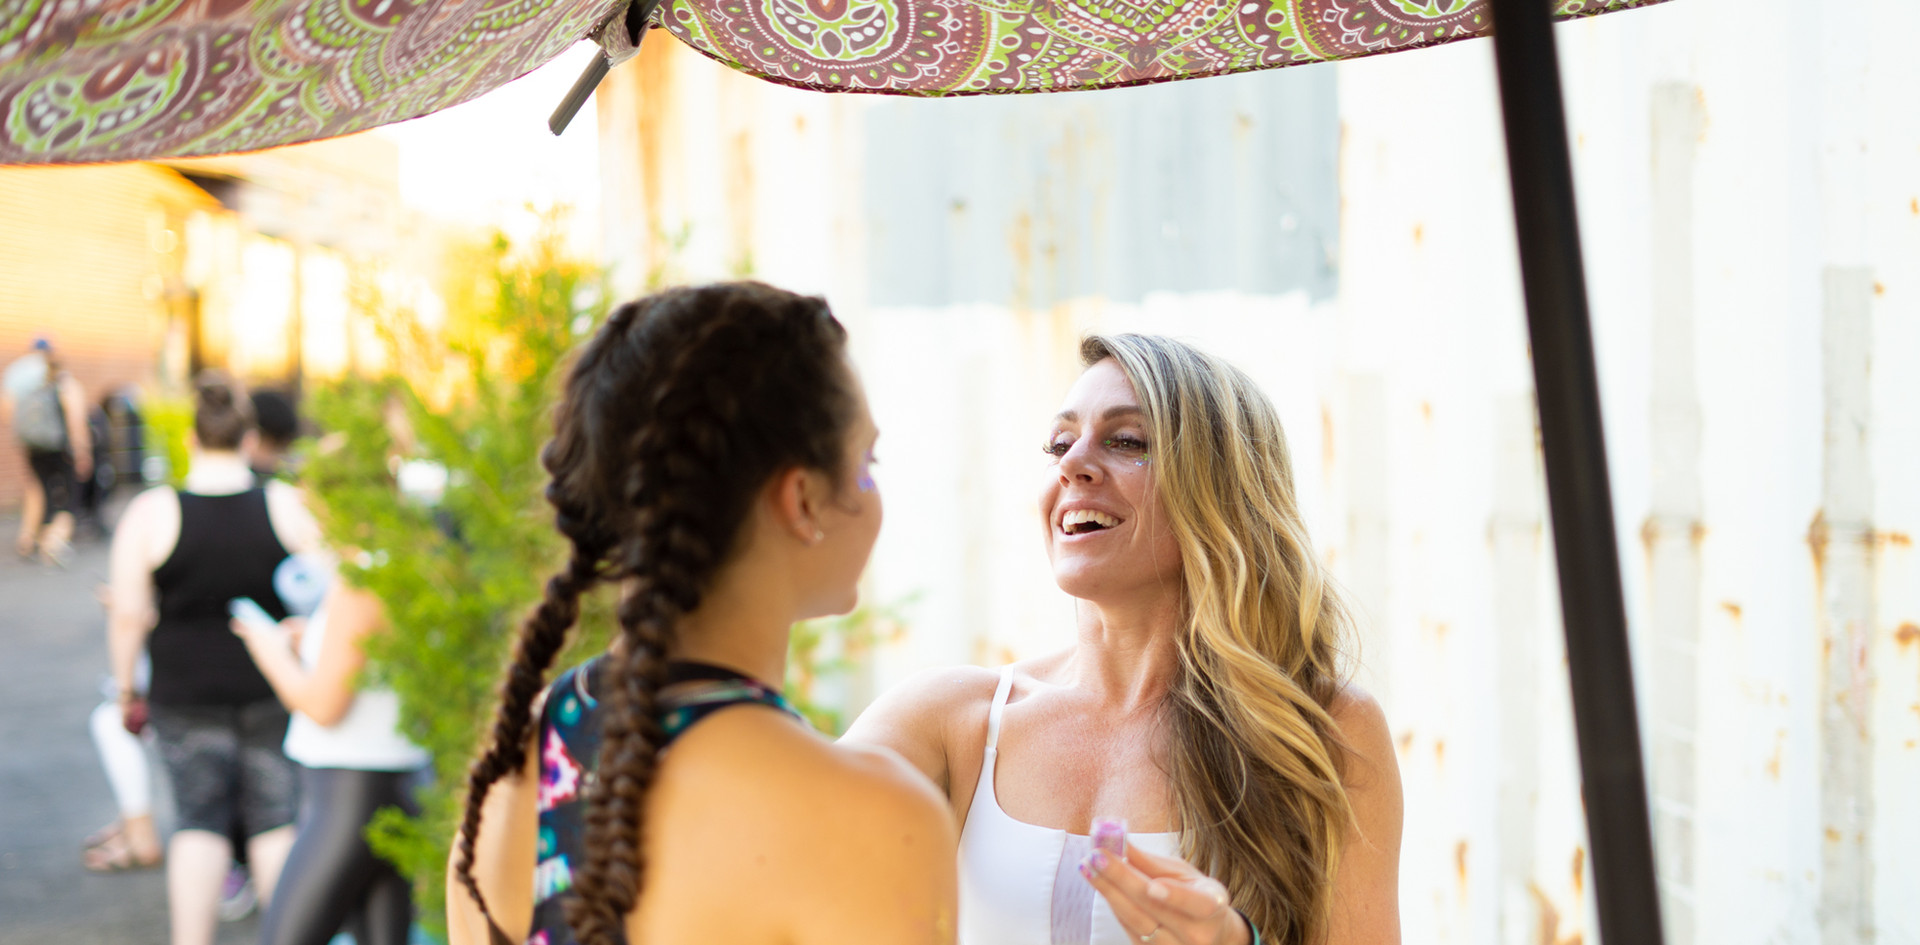 SOLSTICE Yoga with Jaimis Huff x SweatNet Charlotte